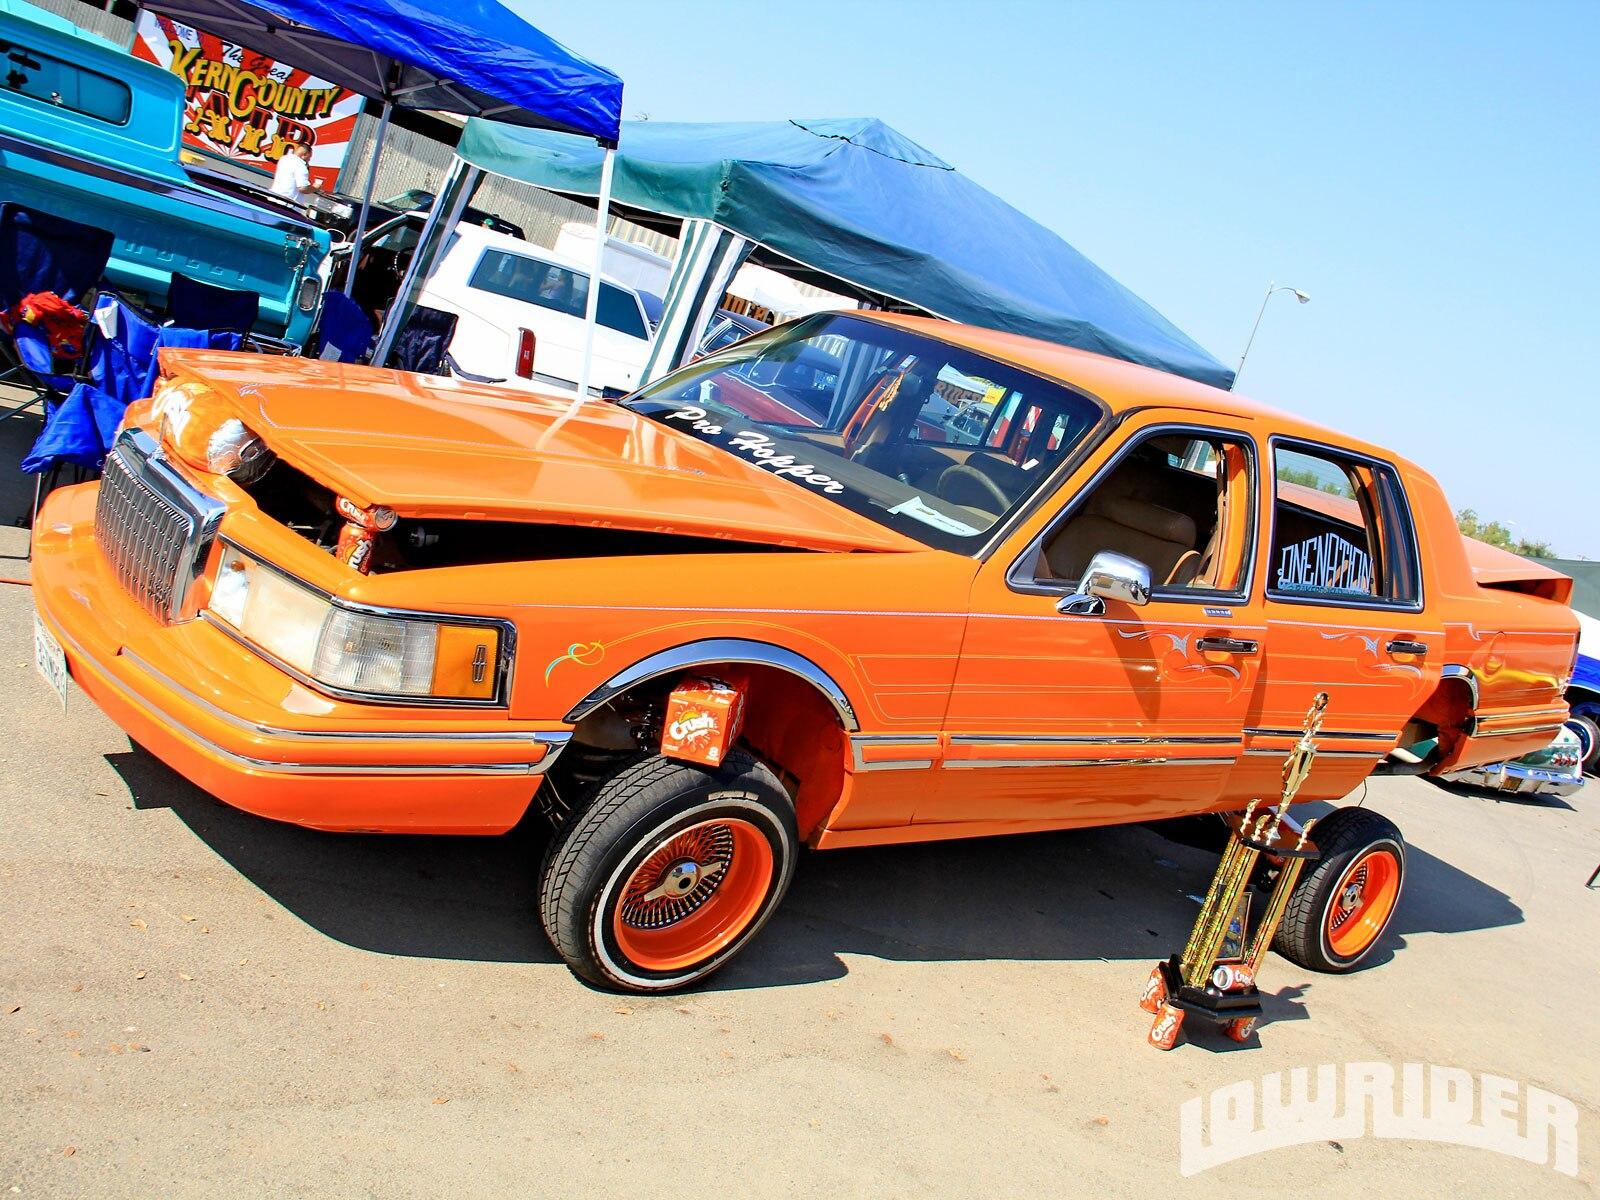 1207-lrmp-03-o-carnales-unidos-annual-benefit-car-show-lincoln-town-car1